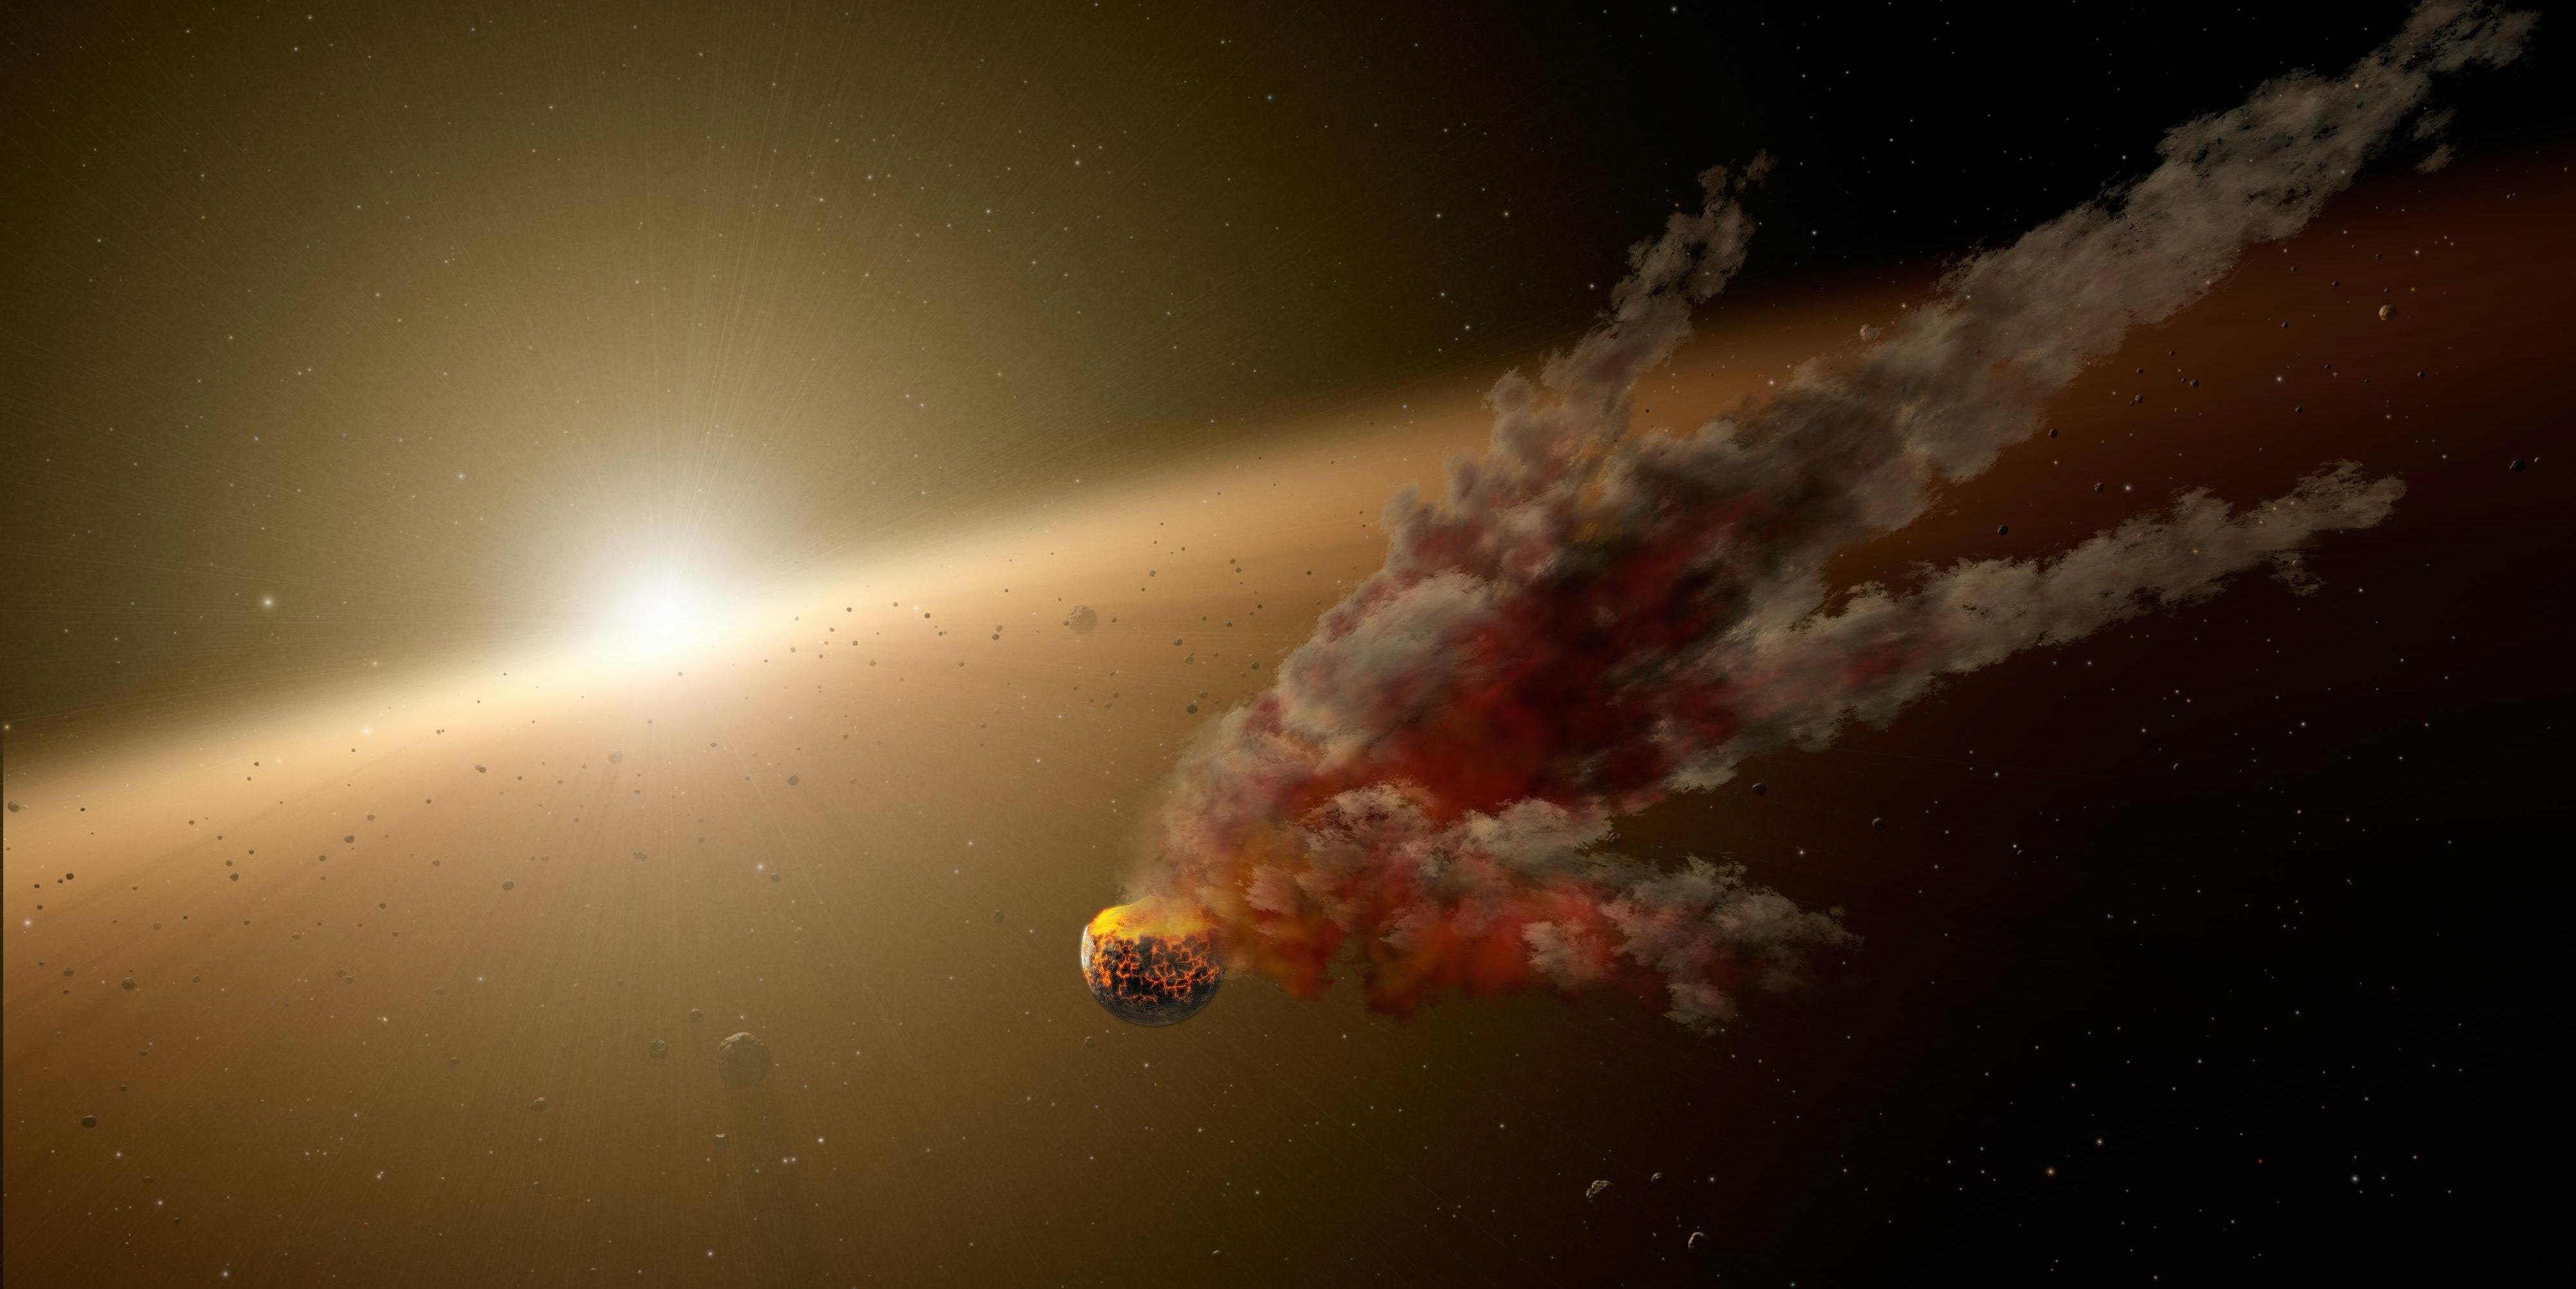 That Weird 'Alien Megastructures' Star Isn't Alone